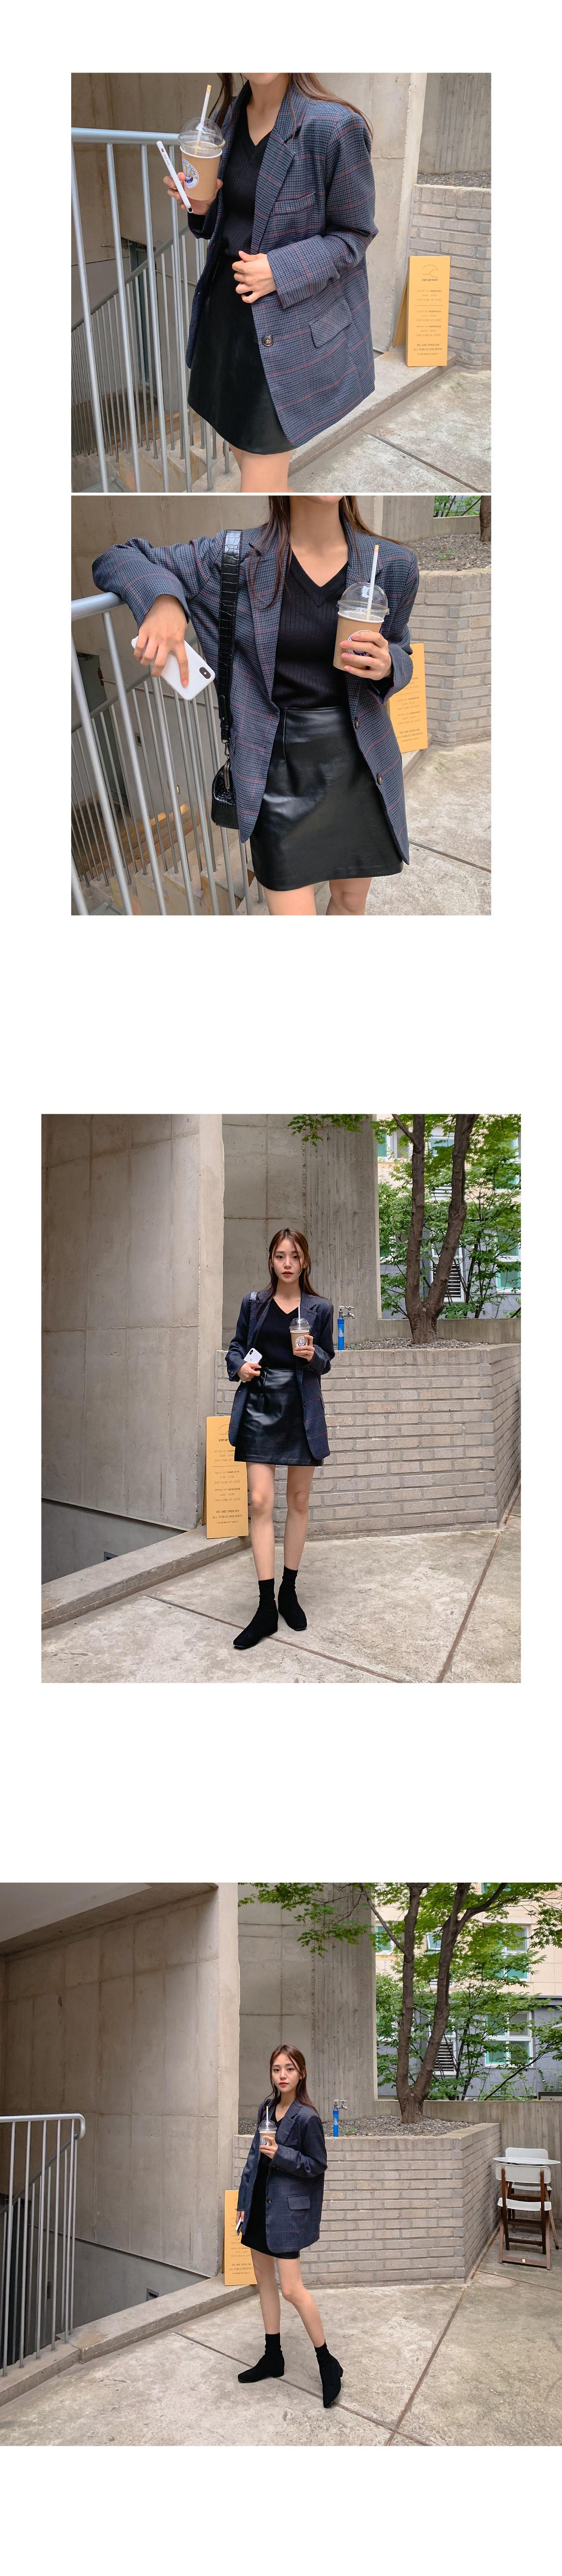 Plum leather skirt _Y